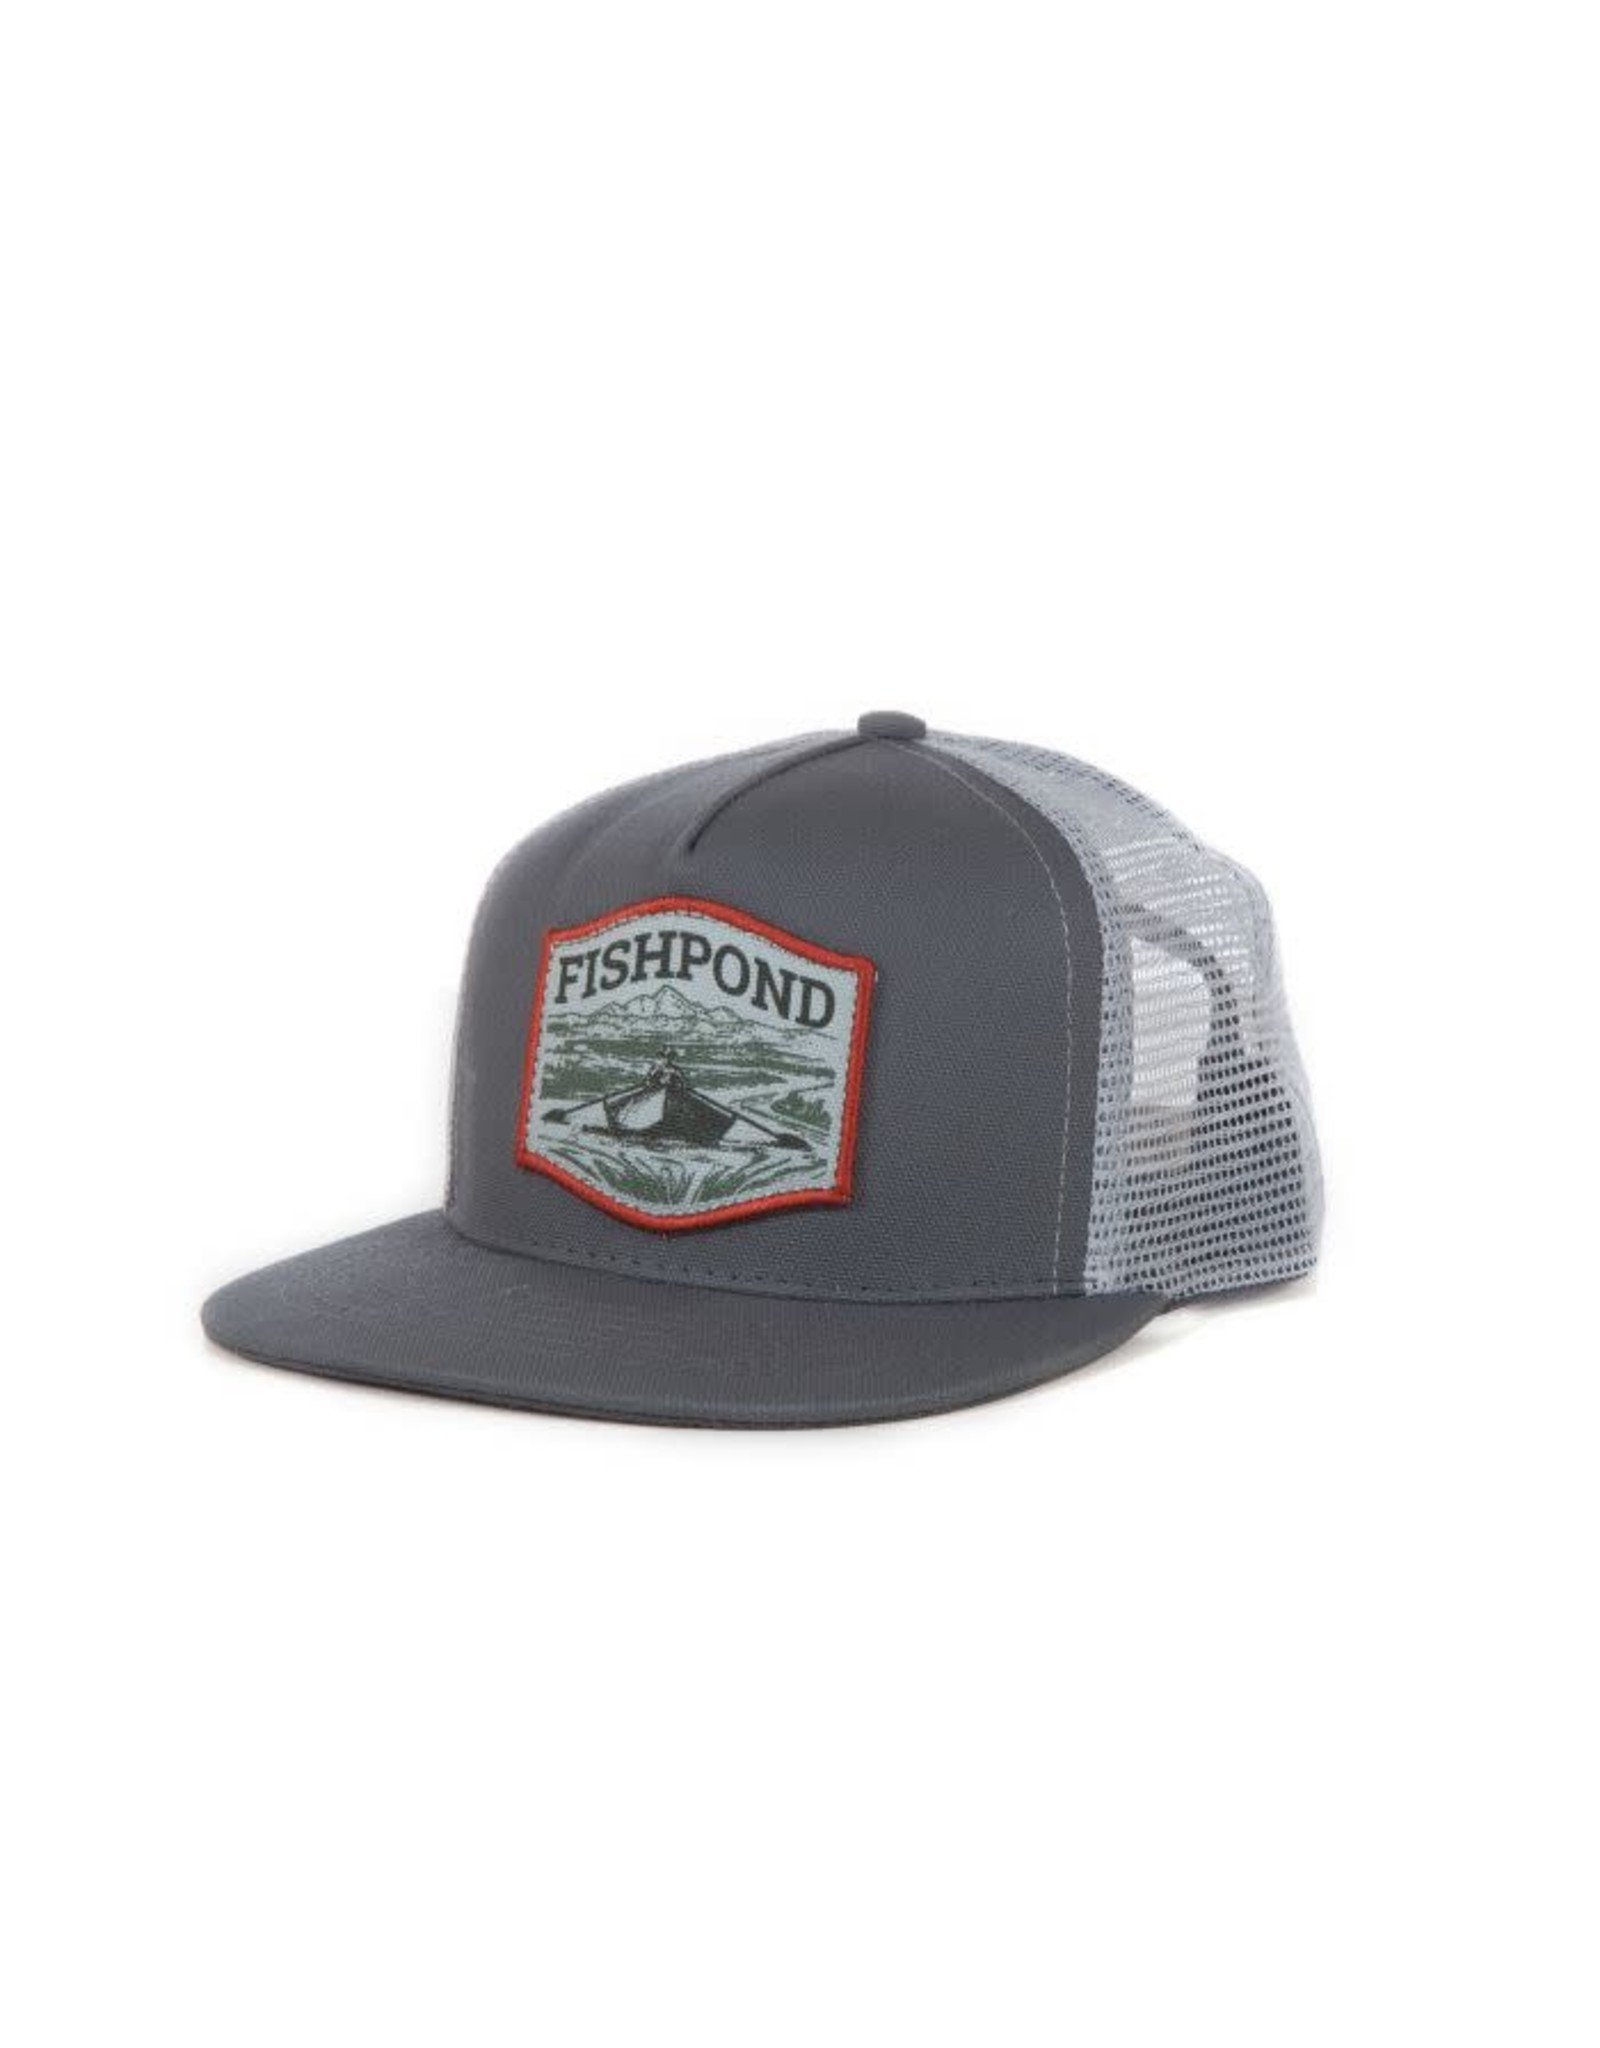 Fishpond Fishpond Drifter Trucker hat